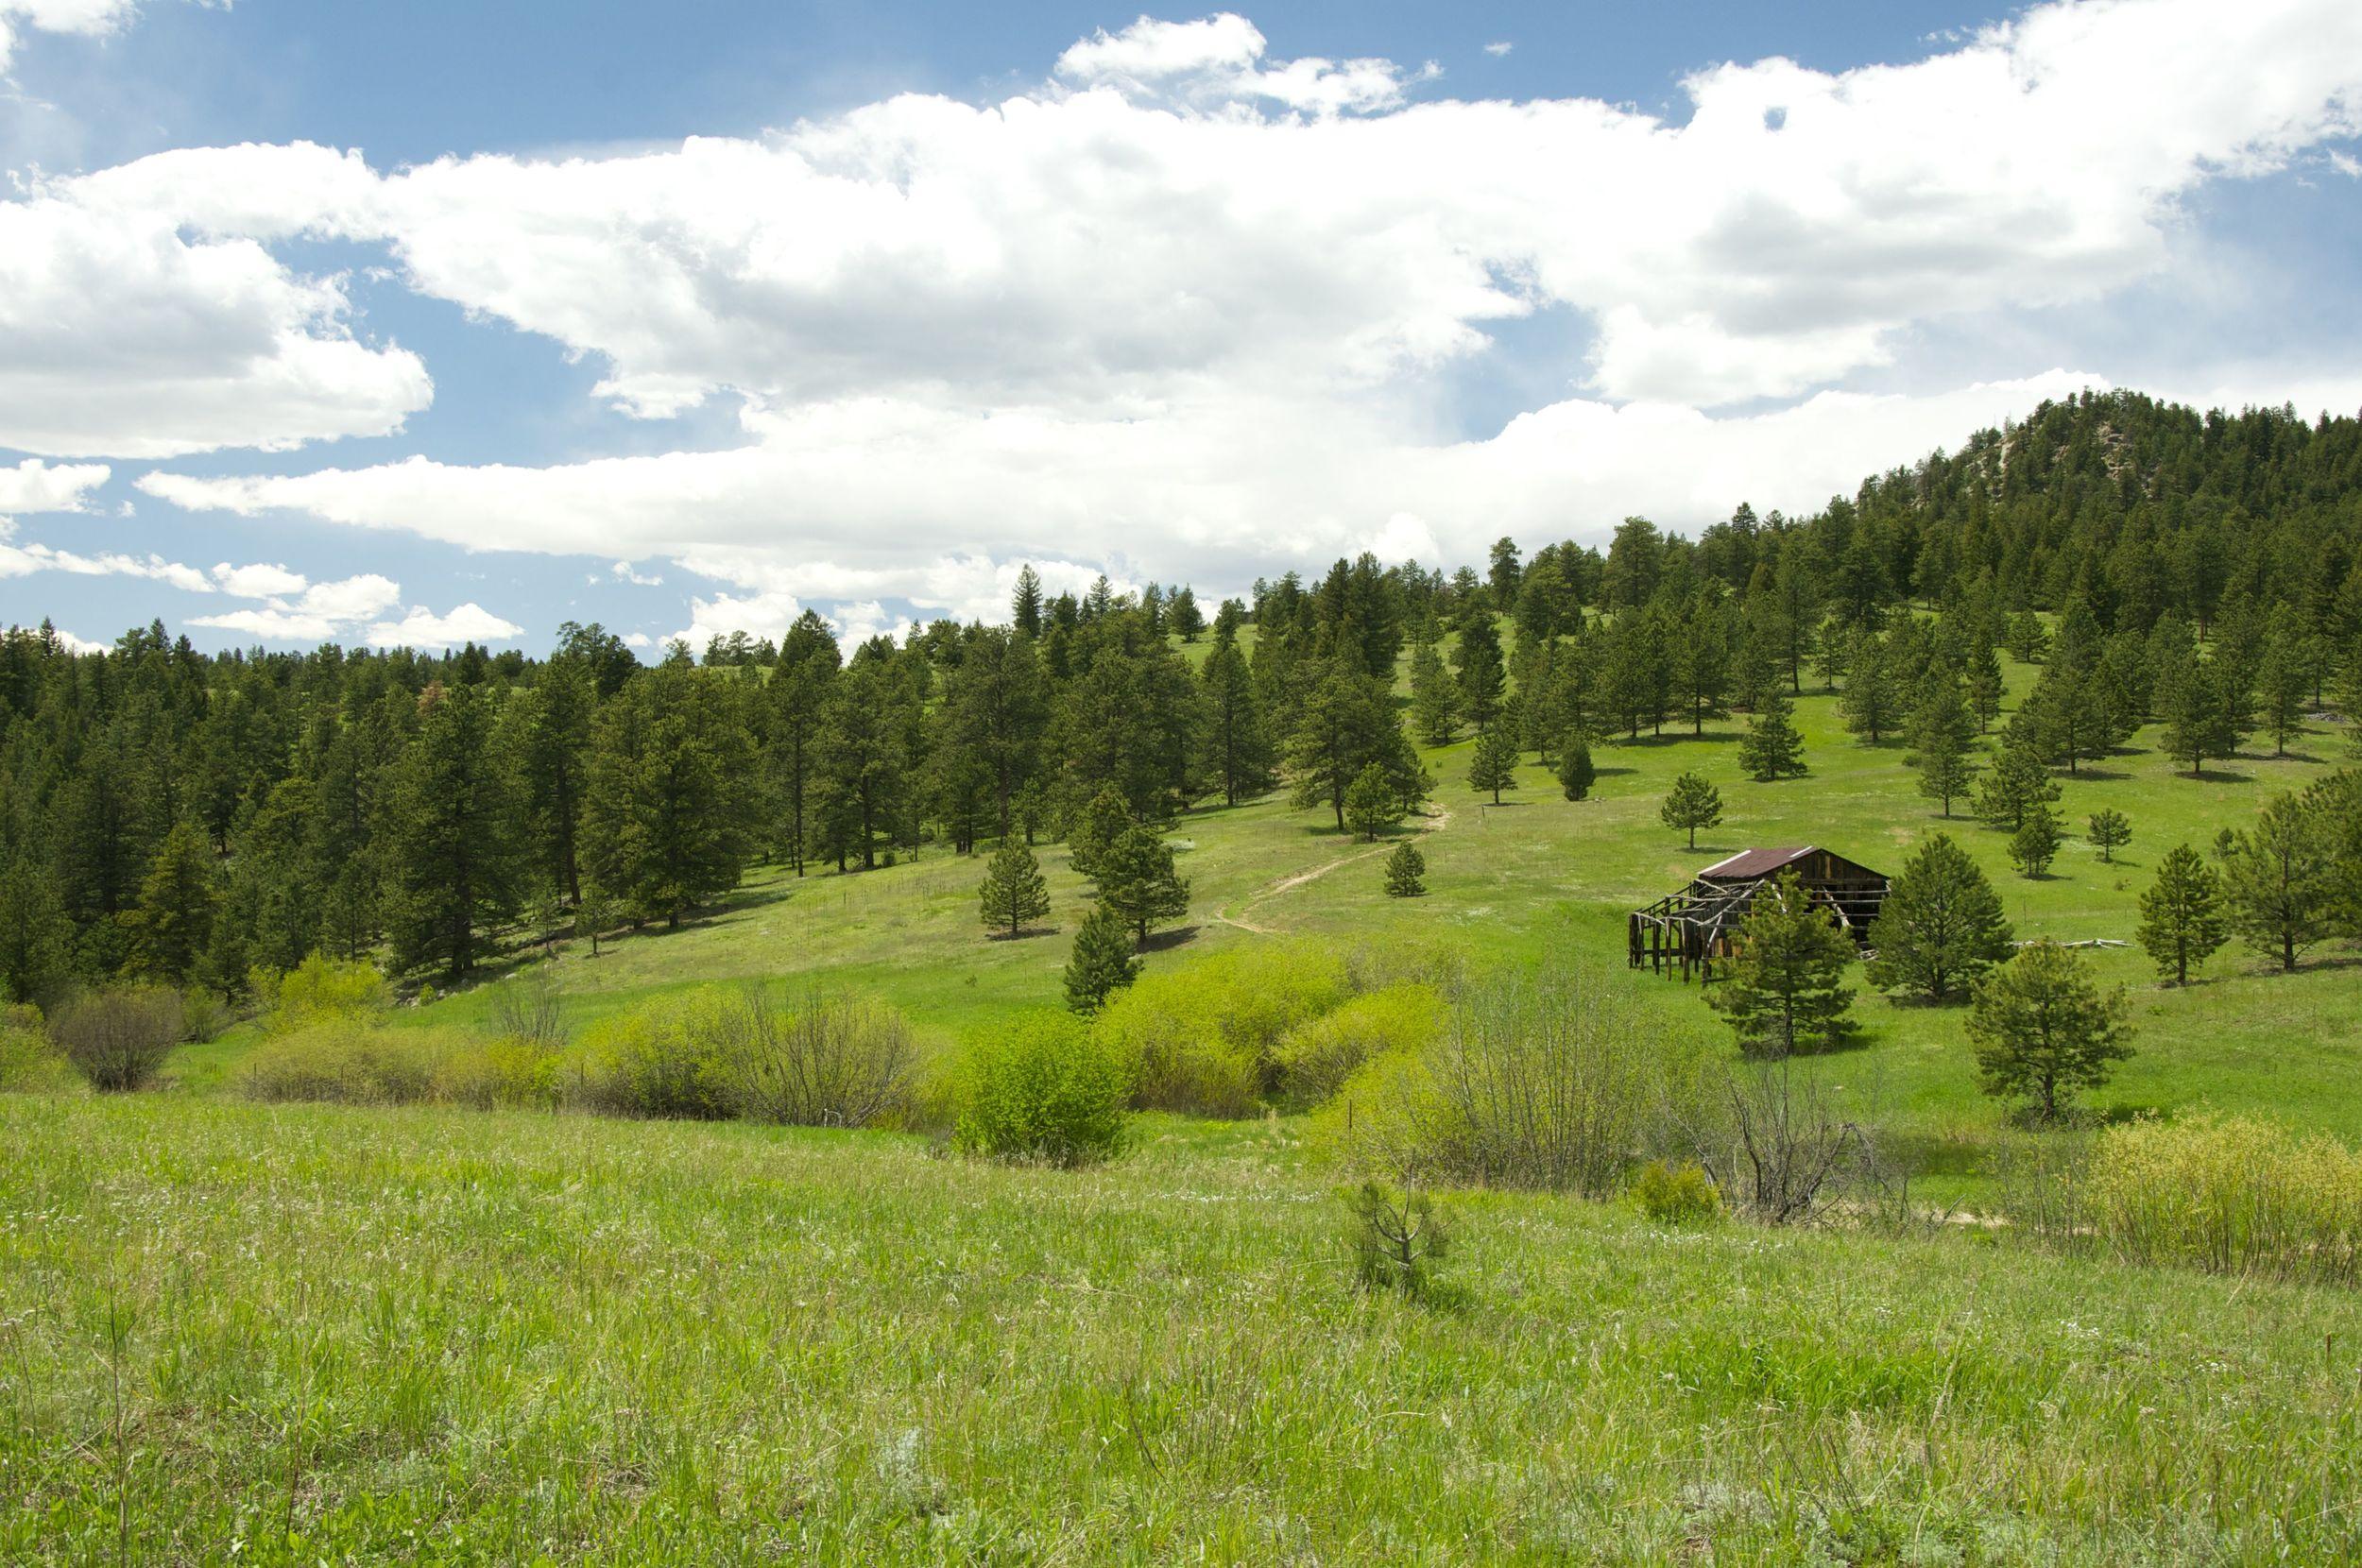 Meyer's Homestead Trail